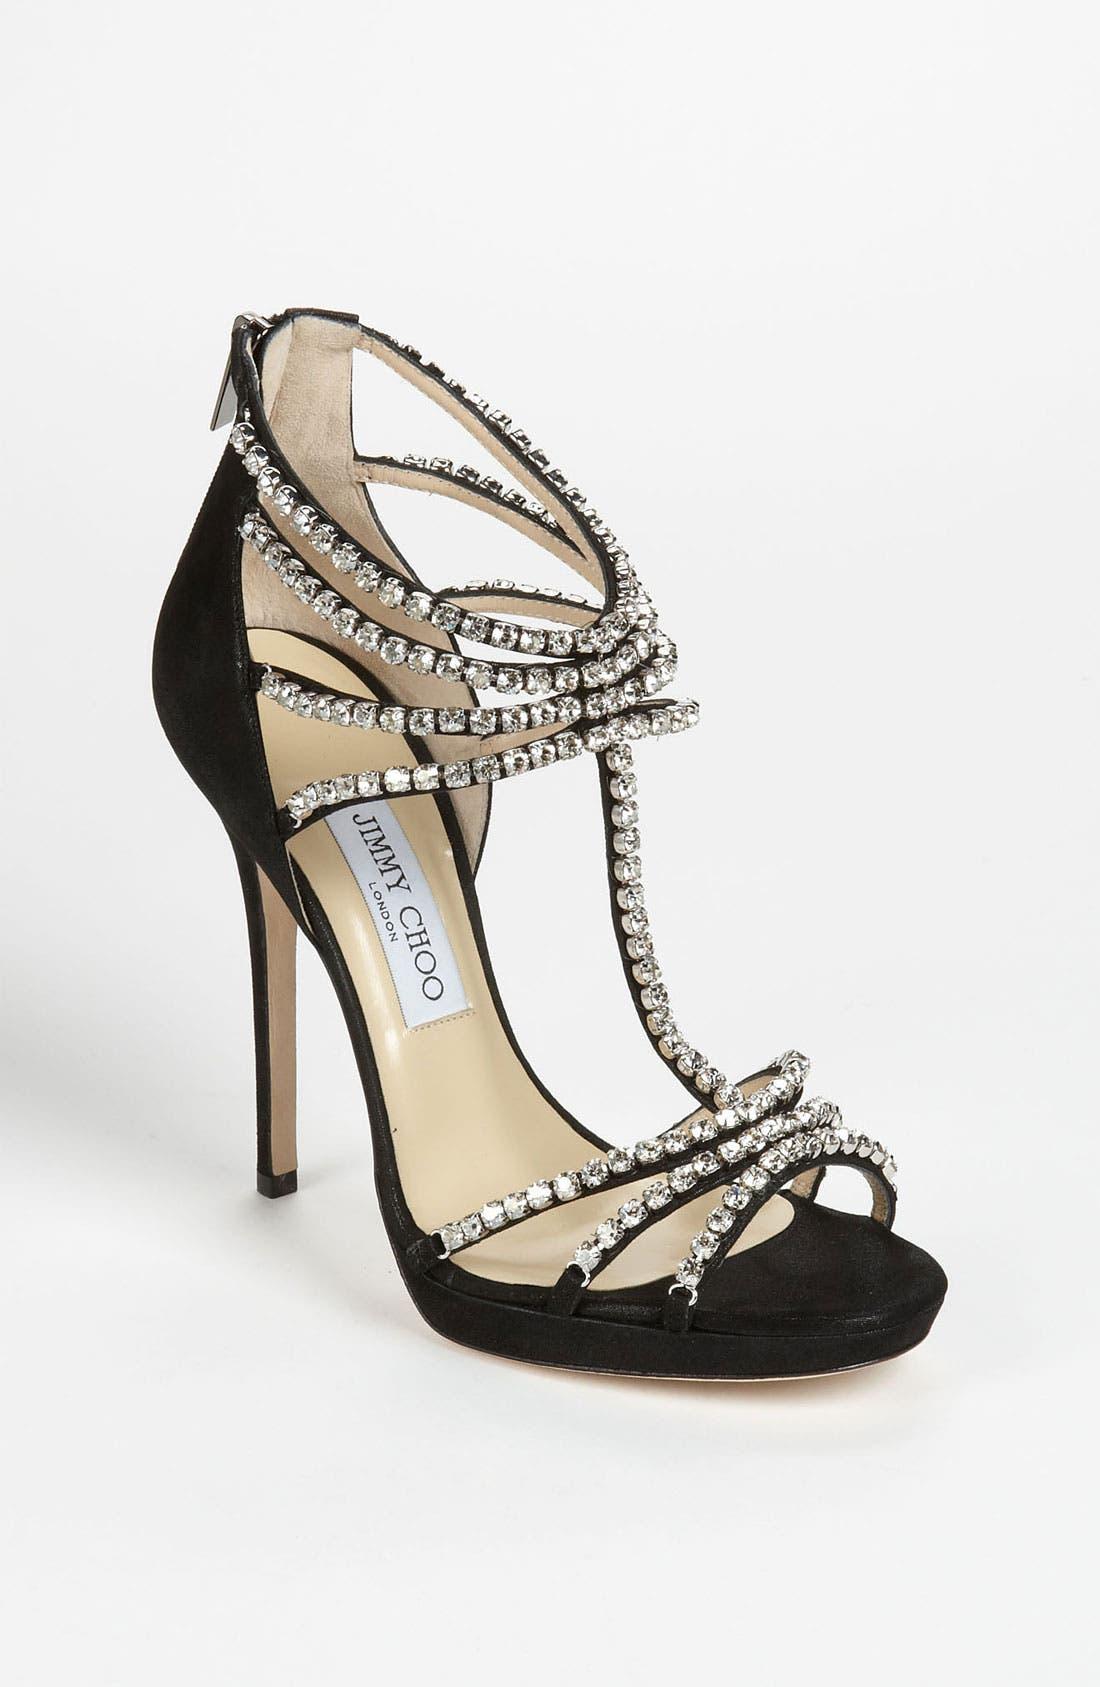 Main Image - Jimmy Choo 'Kera' Platform Sandal